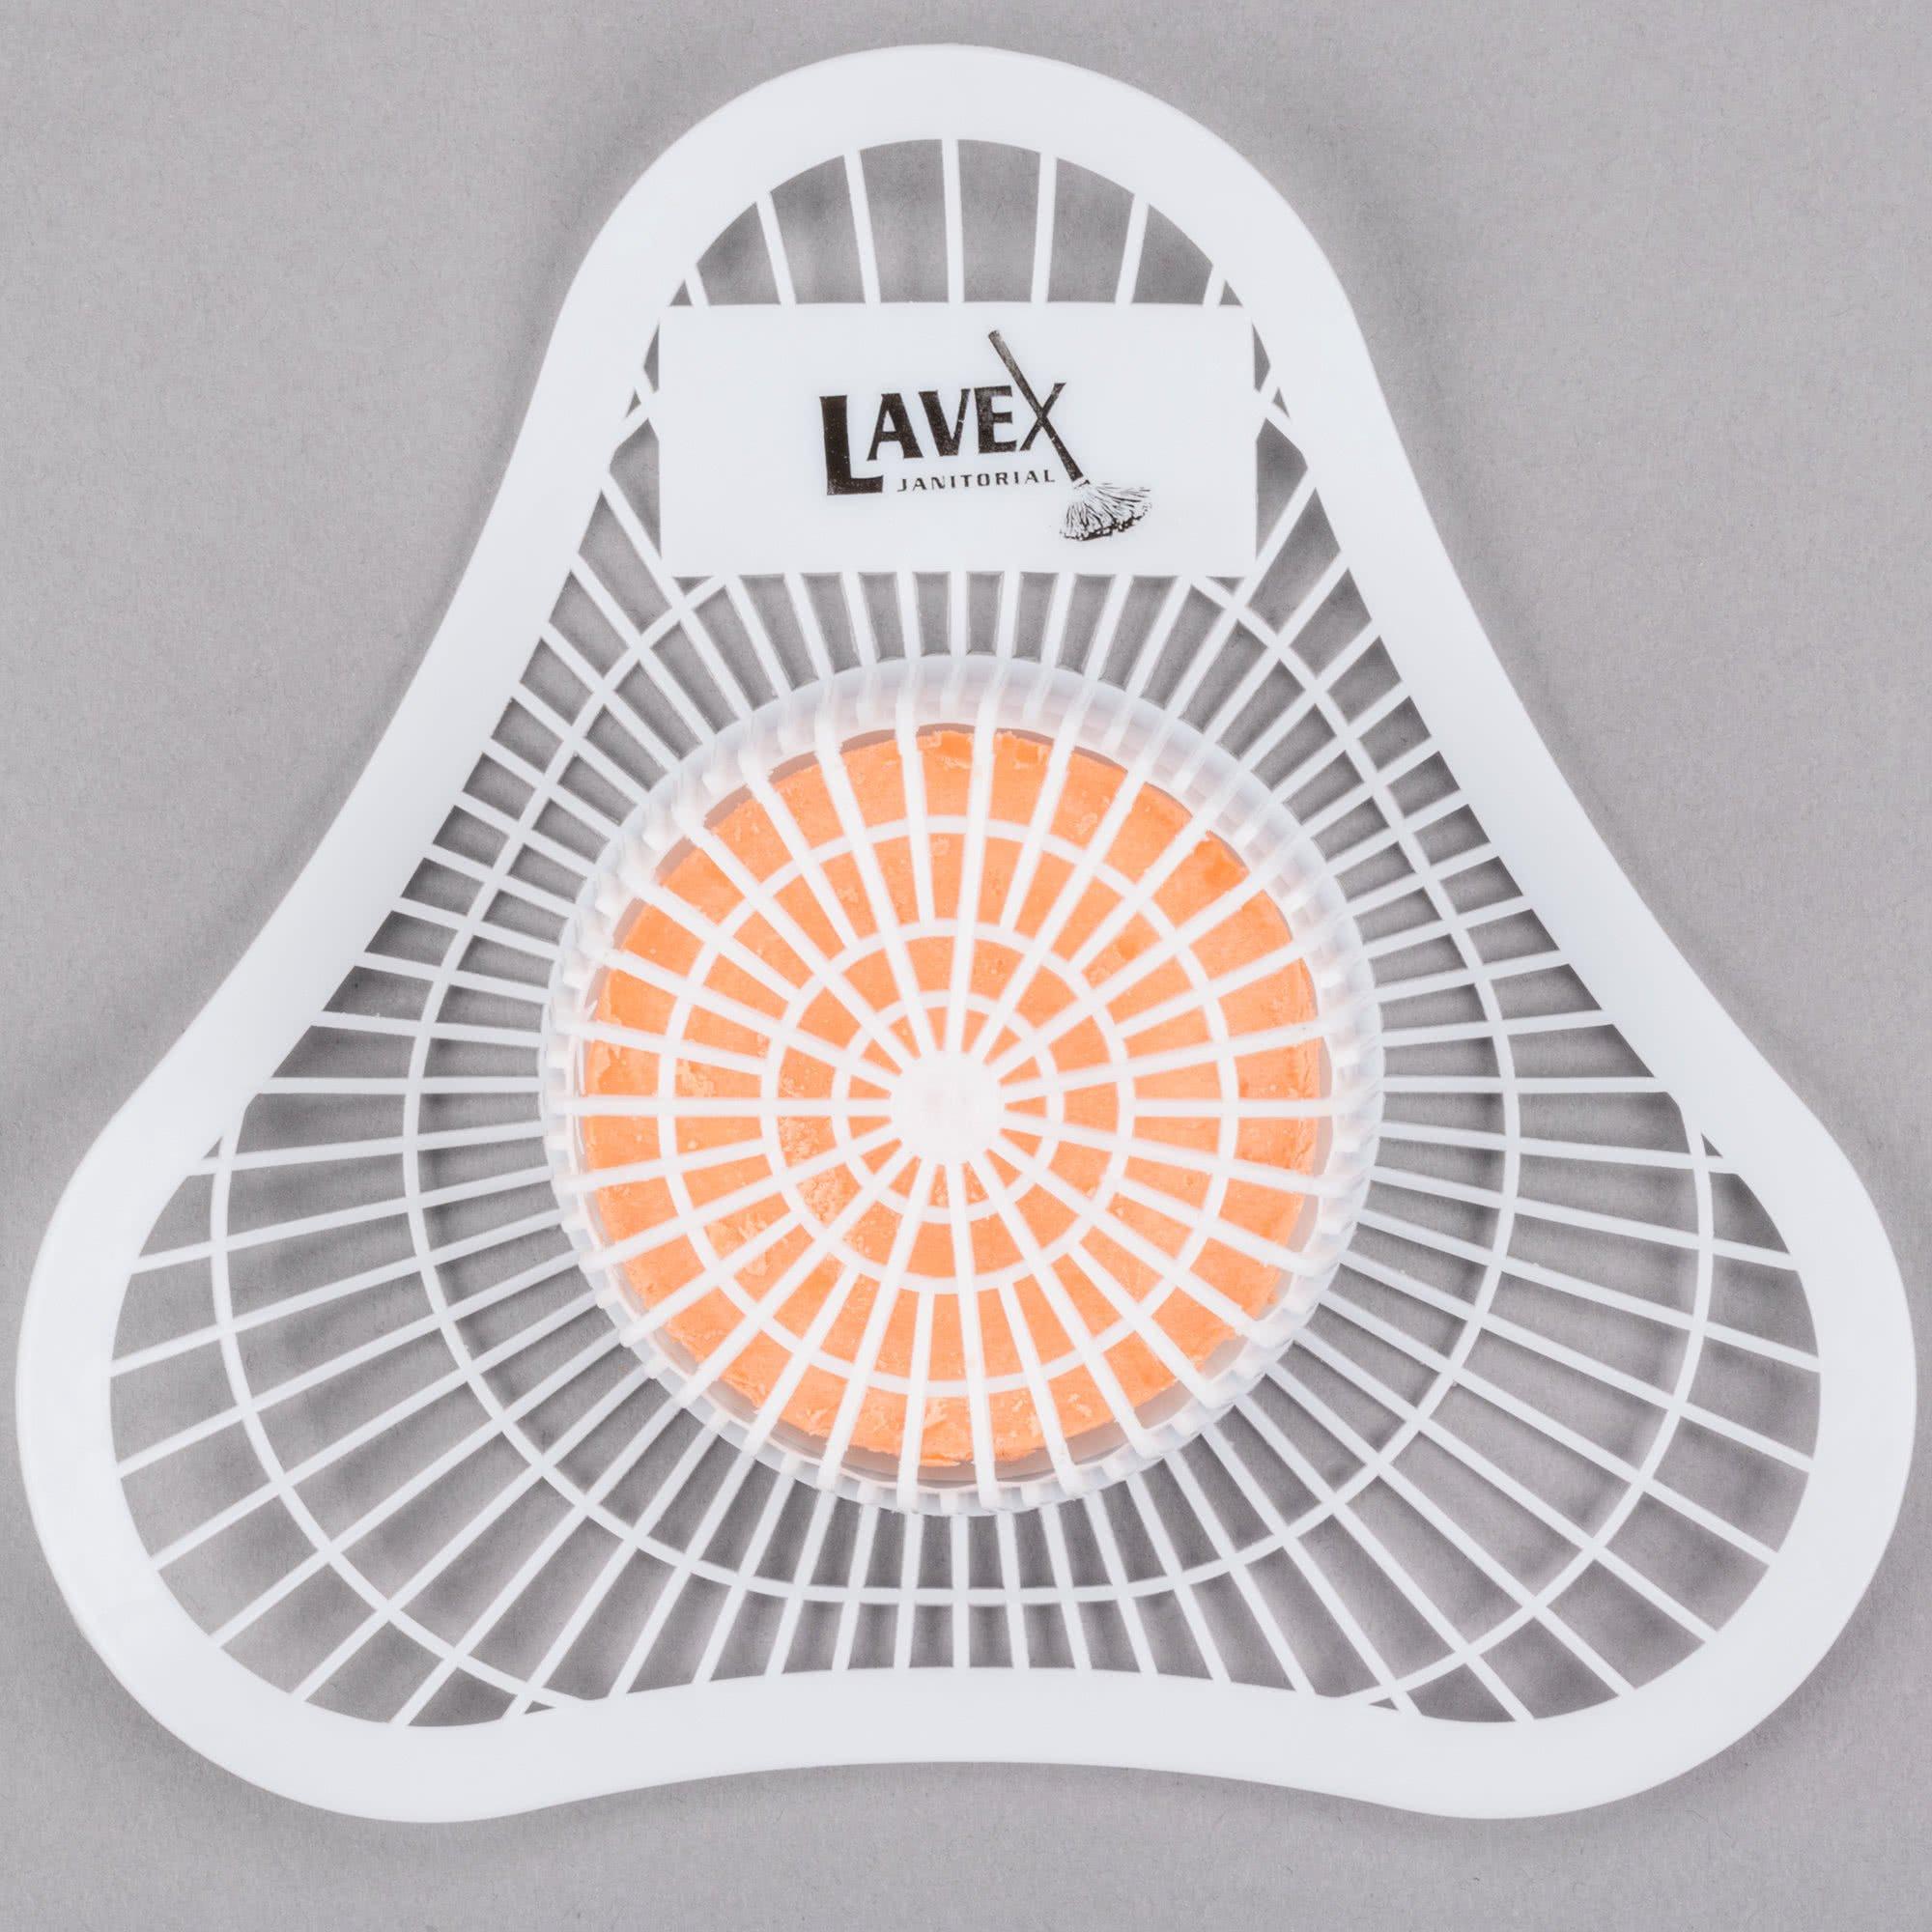 Lavex Urinal Screen and Deodorizer | Orange Deodorizing Block | Universal Fit | Citrus Scent | 12 Pack